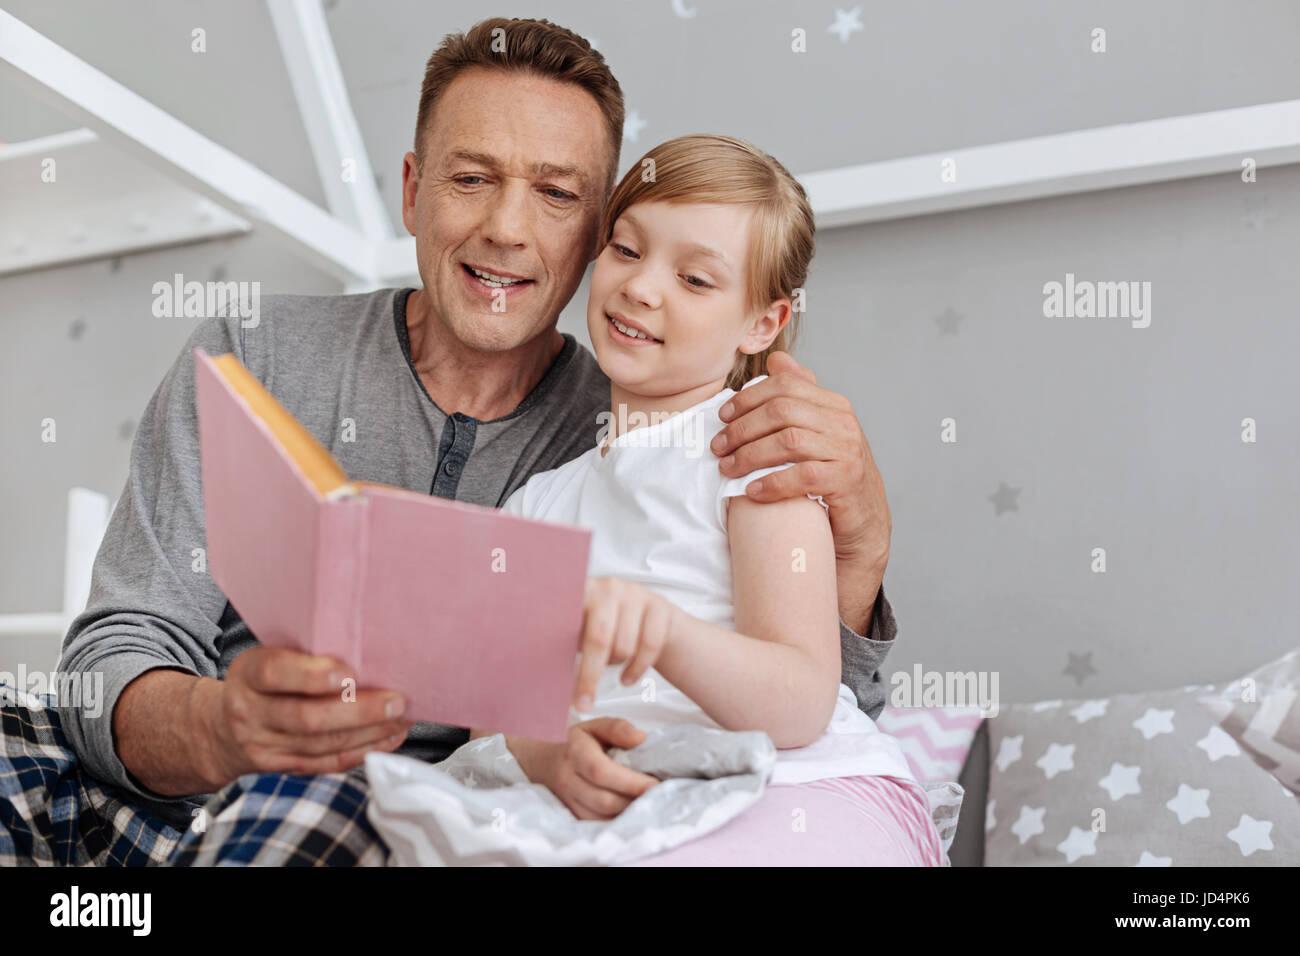 Nice loving man putting his child to sleep - Stock Image